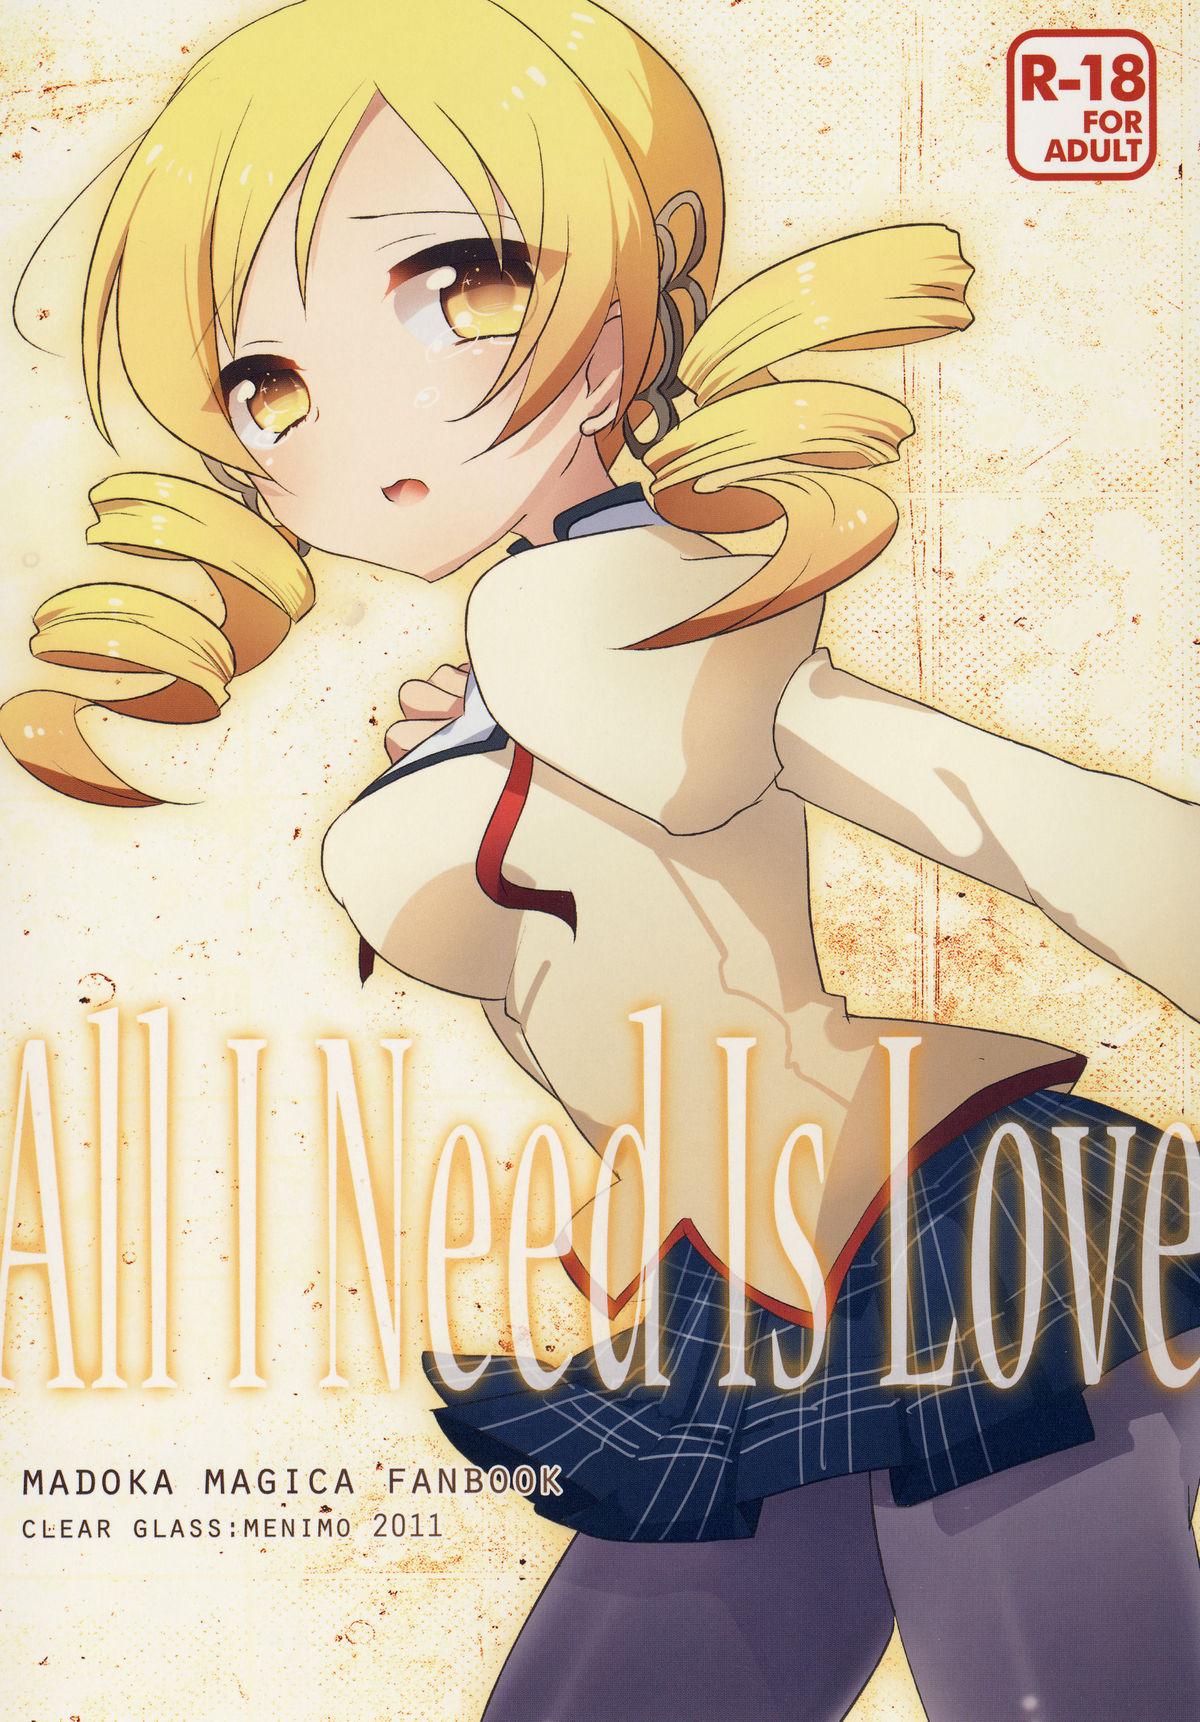 All_I_Need_Is_Love_01_1.jpg